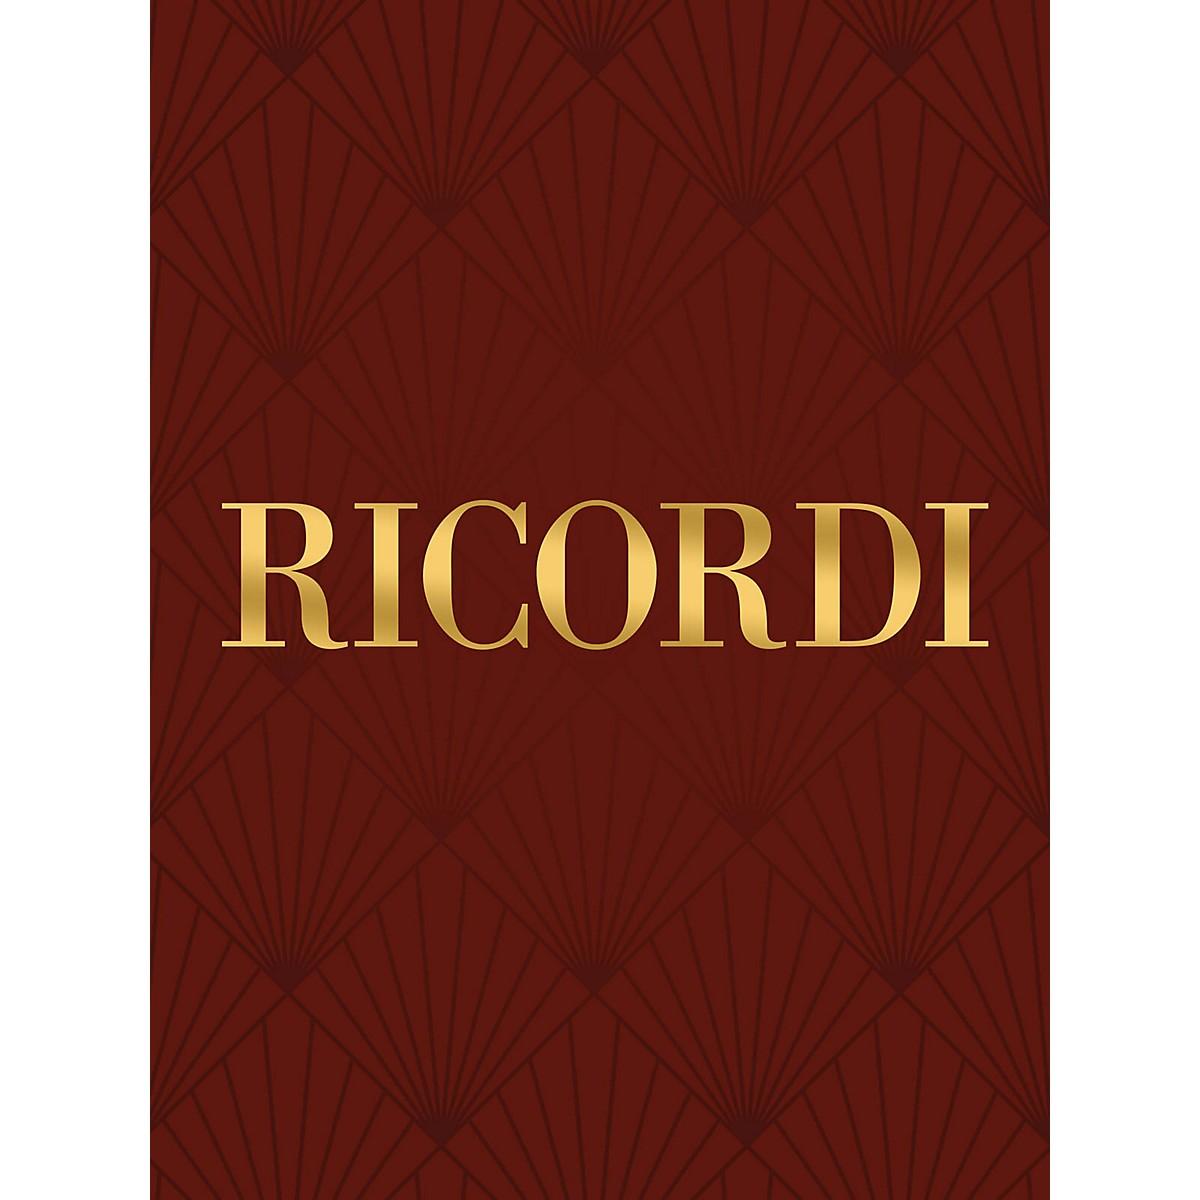 Ricordi Composizioni Originali - Volume 1 (Sonata D Op. 6, 3 Marches Op. 45) Piano Series by Ludwig van Beethoven